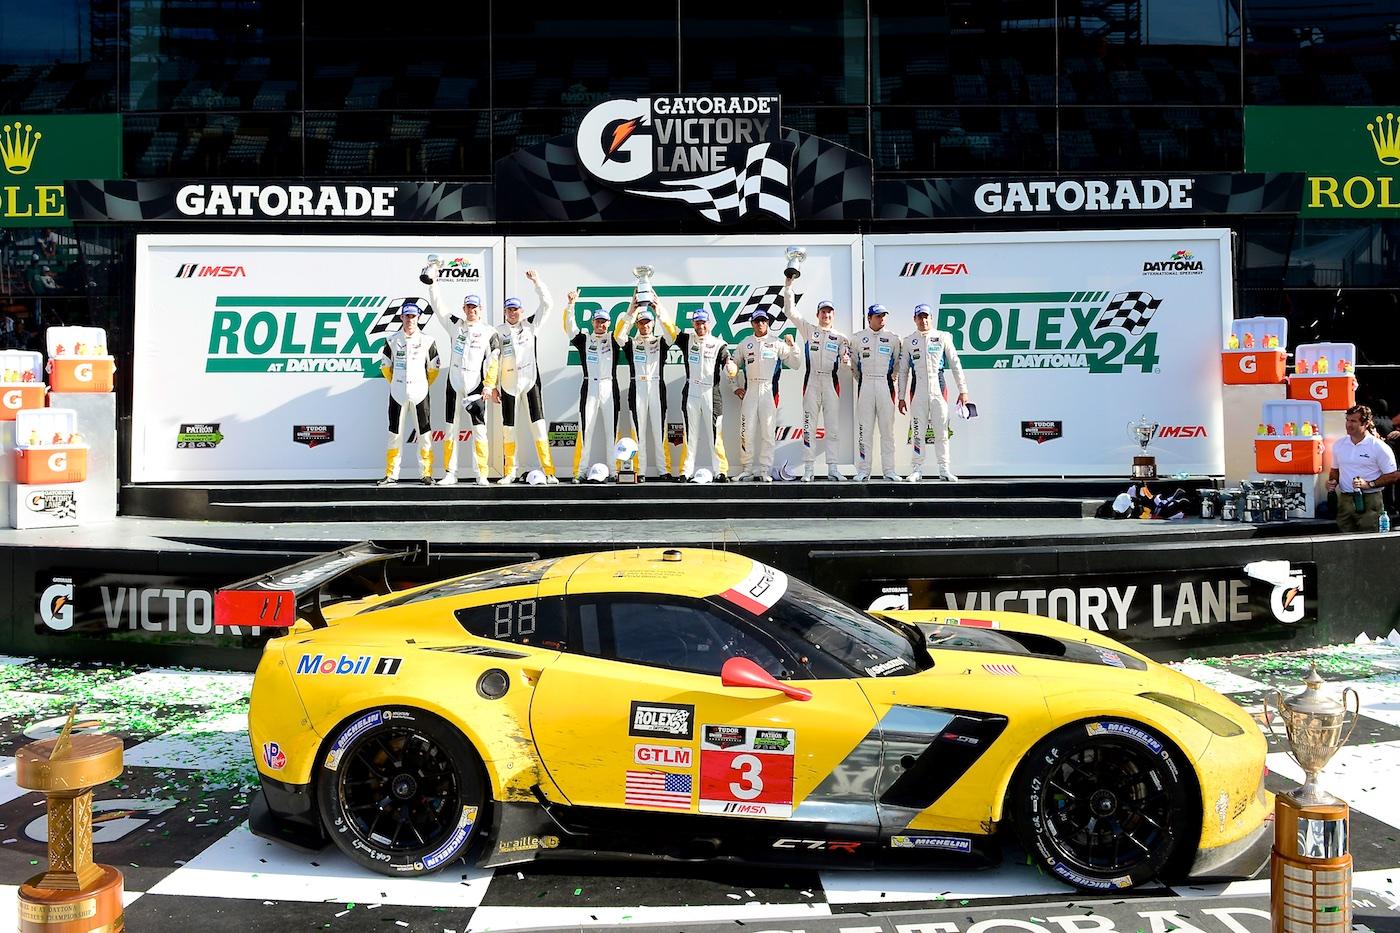 2015 Rolex 24 Hours at Daytona Corvette c7.r podium